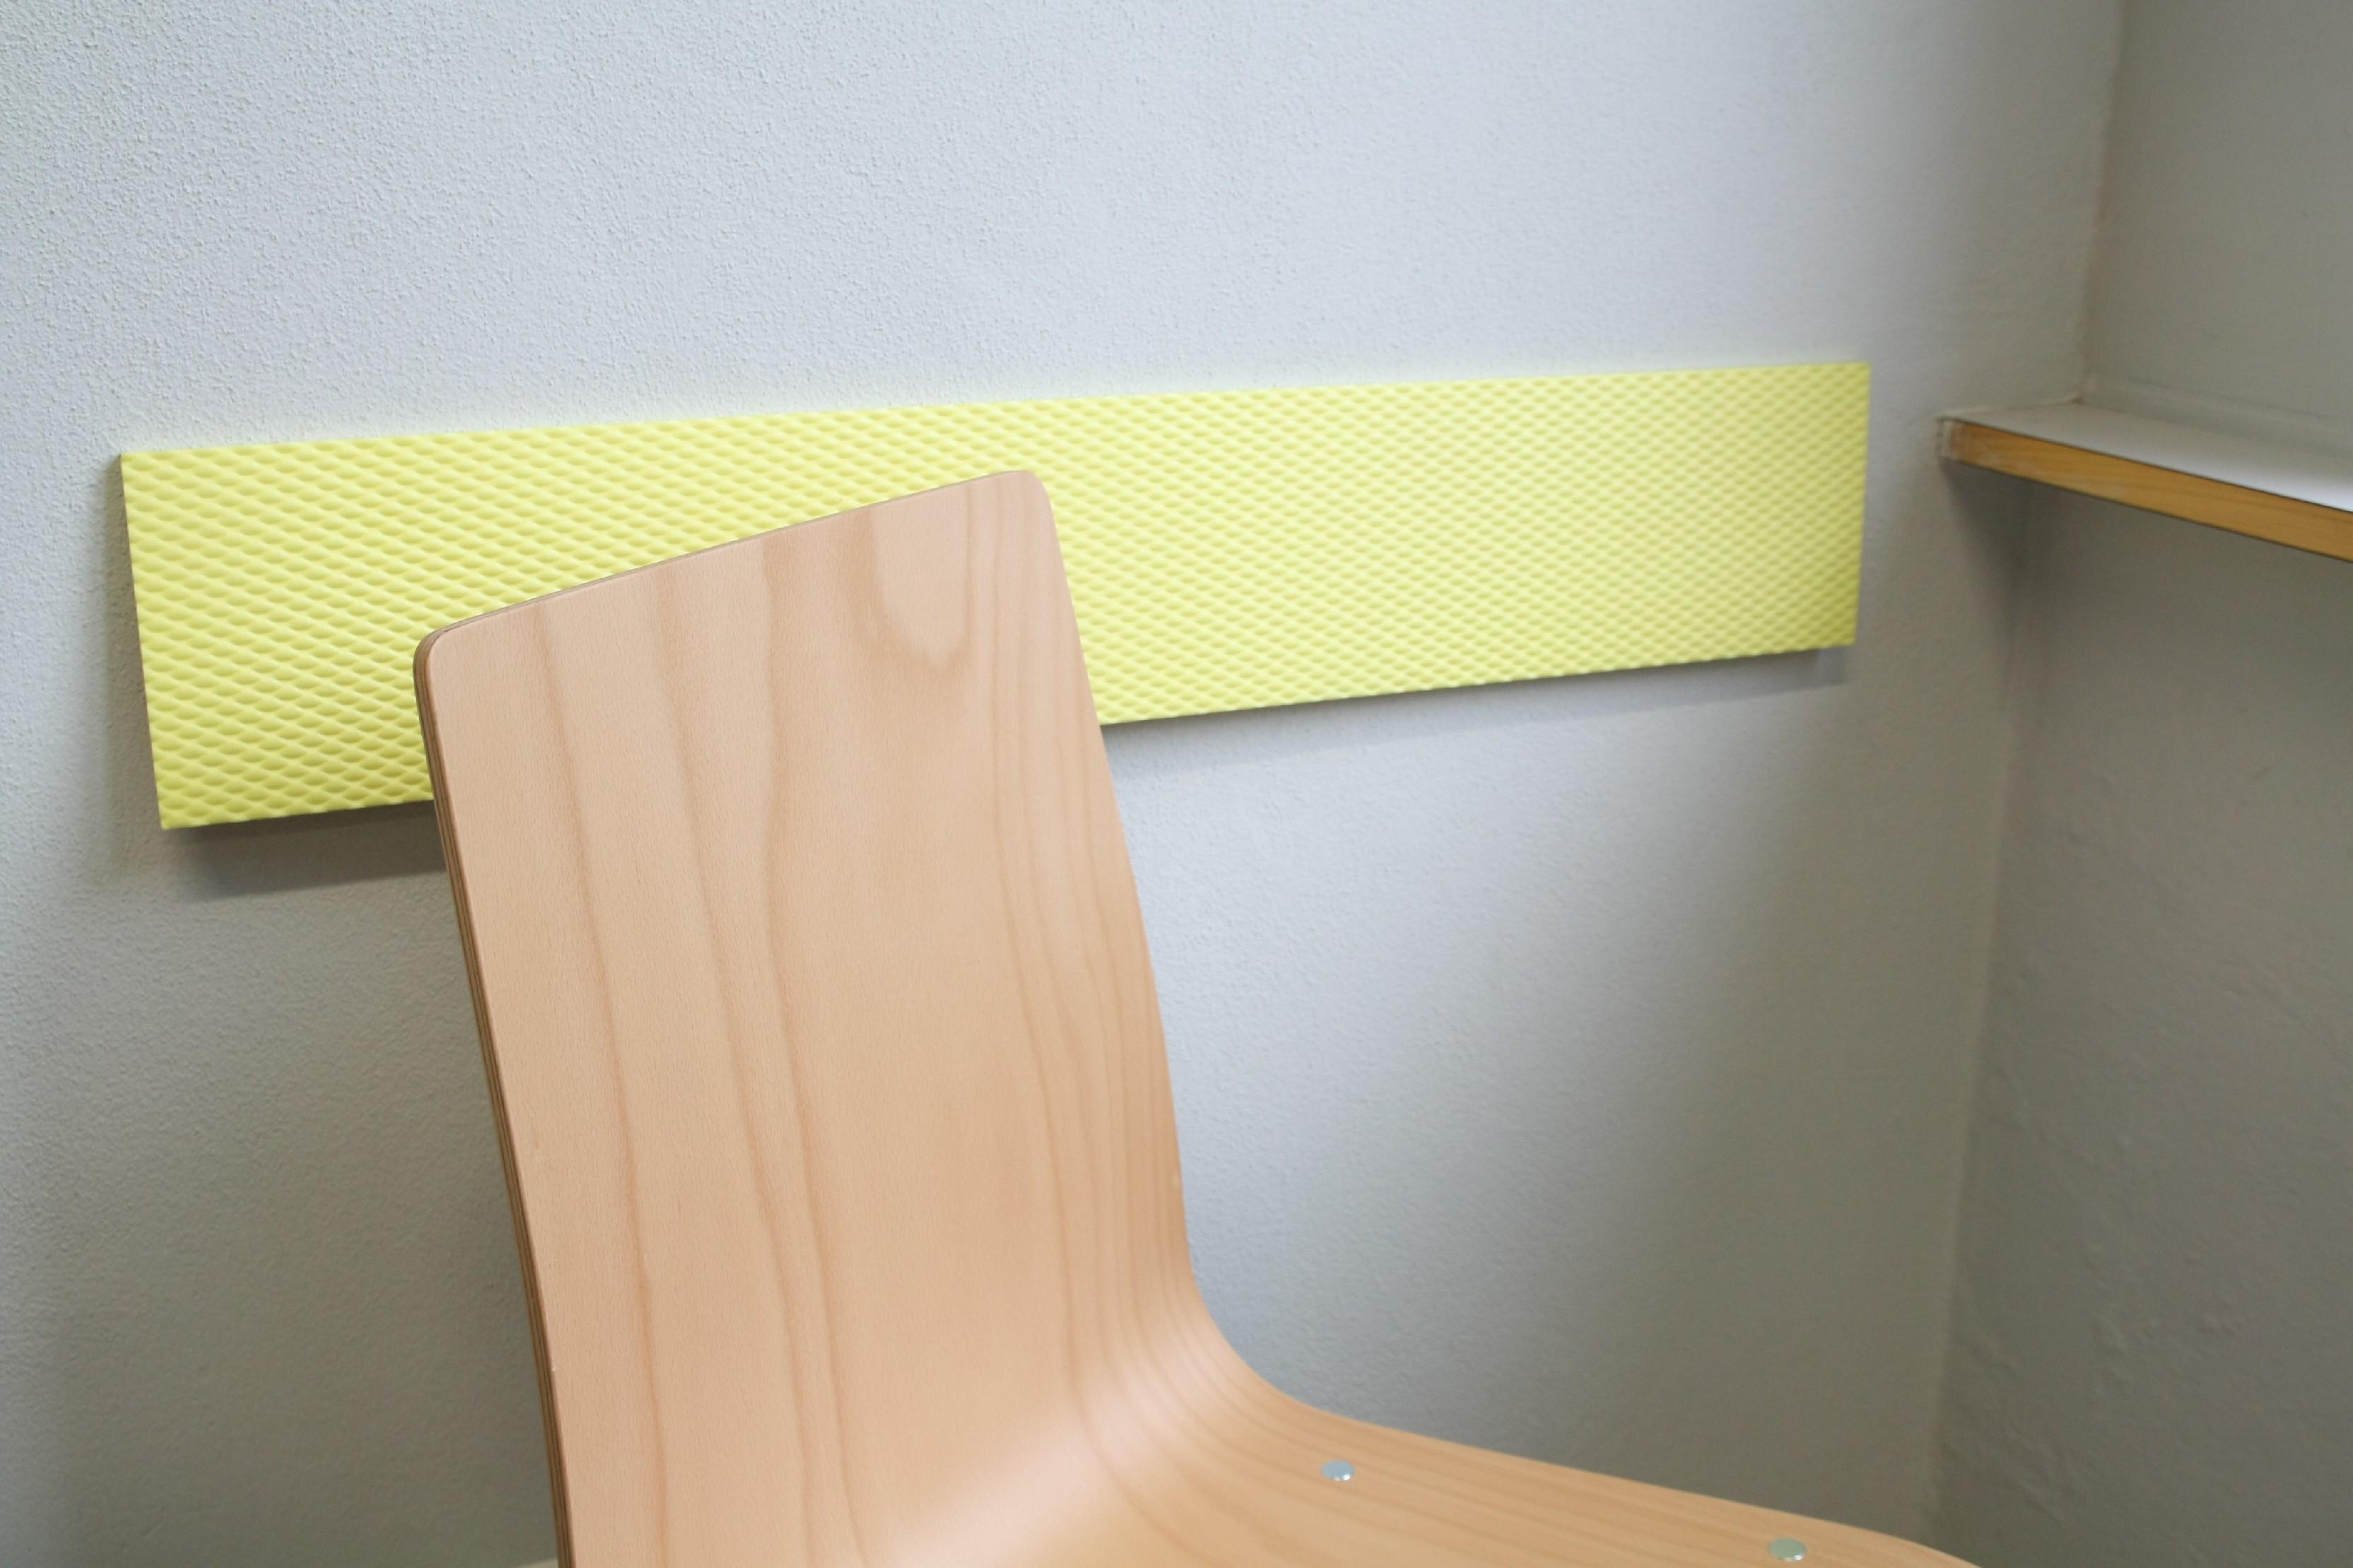 Ochranný pěnový pás samolepící Barva: Bílá